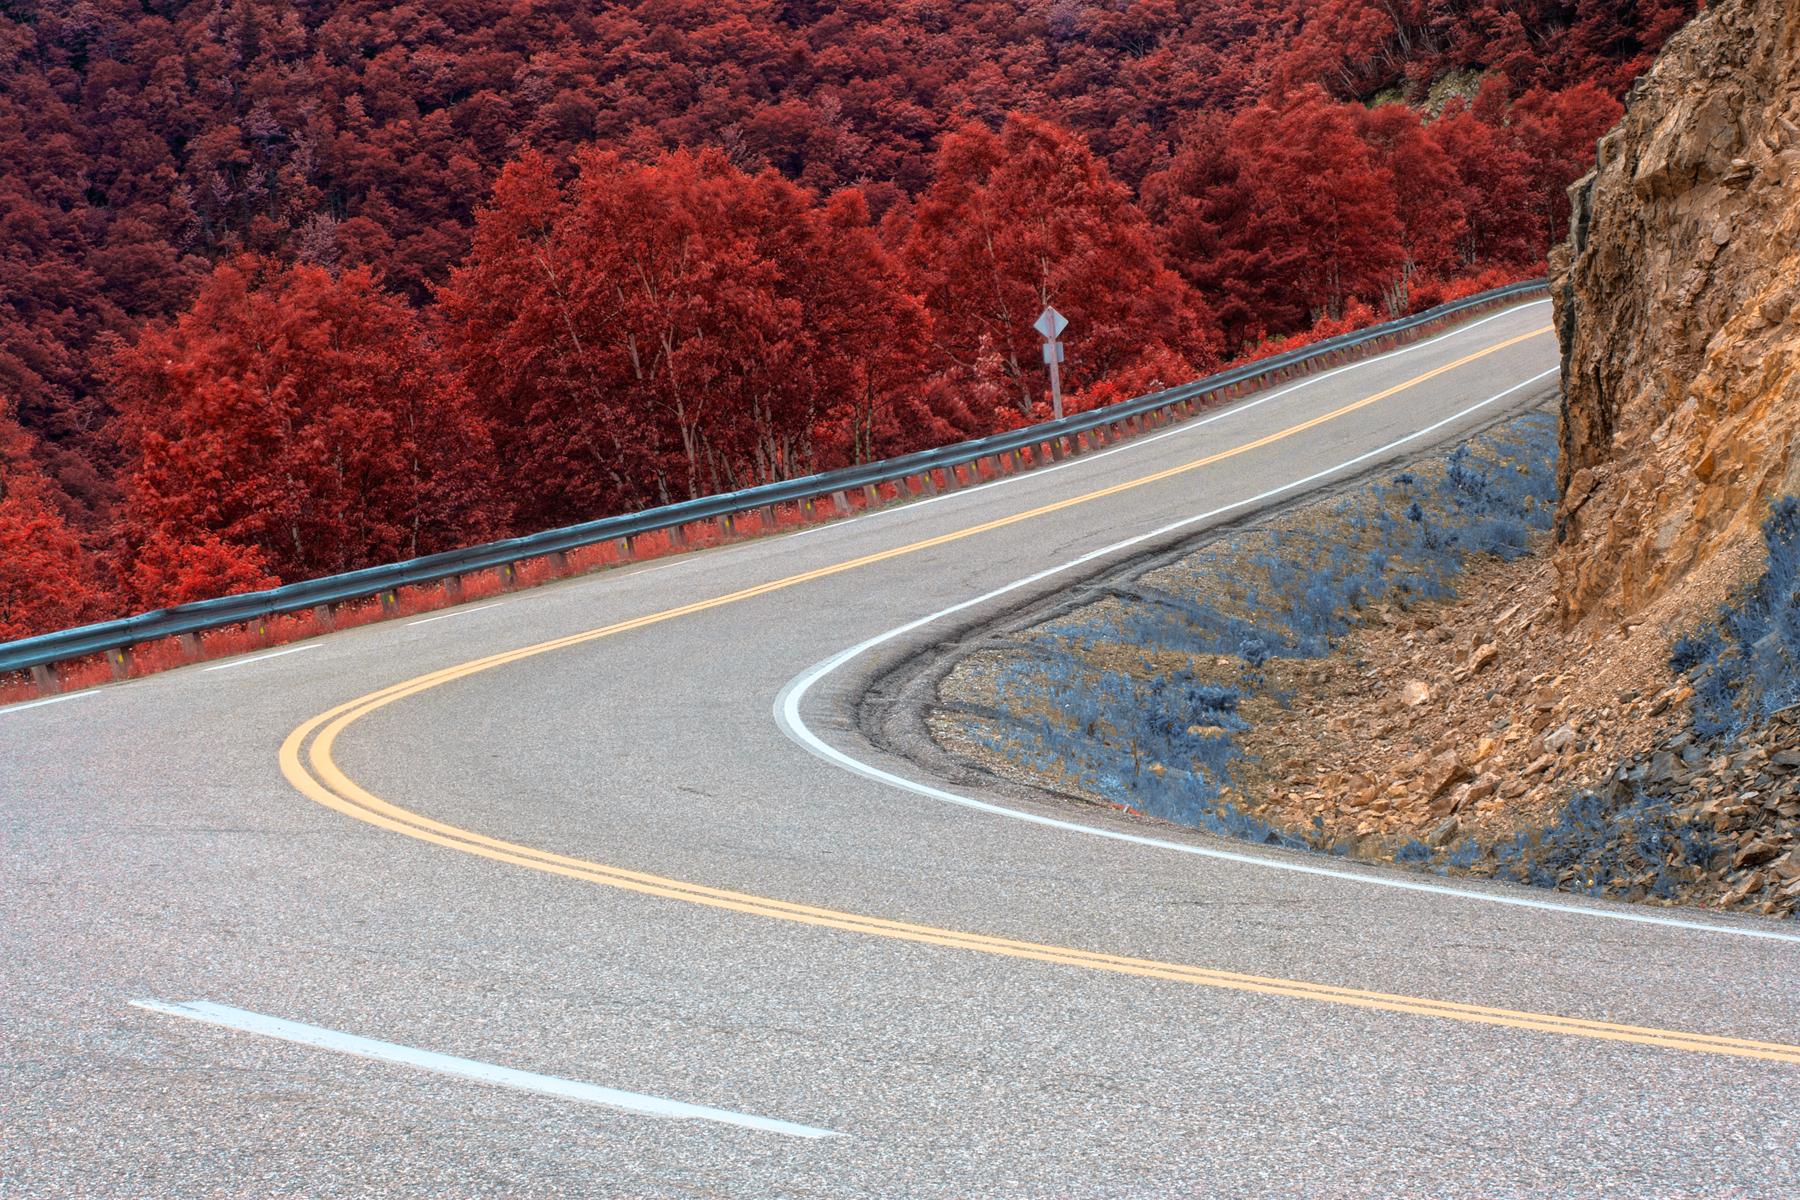 Winding road - split tone hdr photo